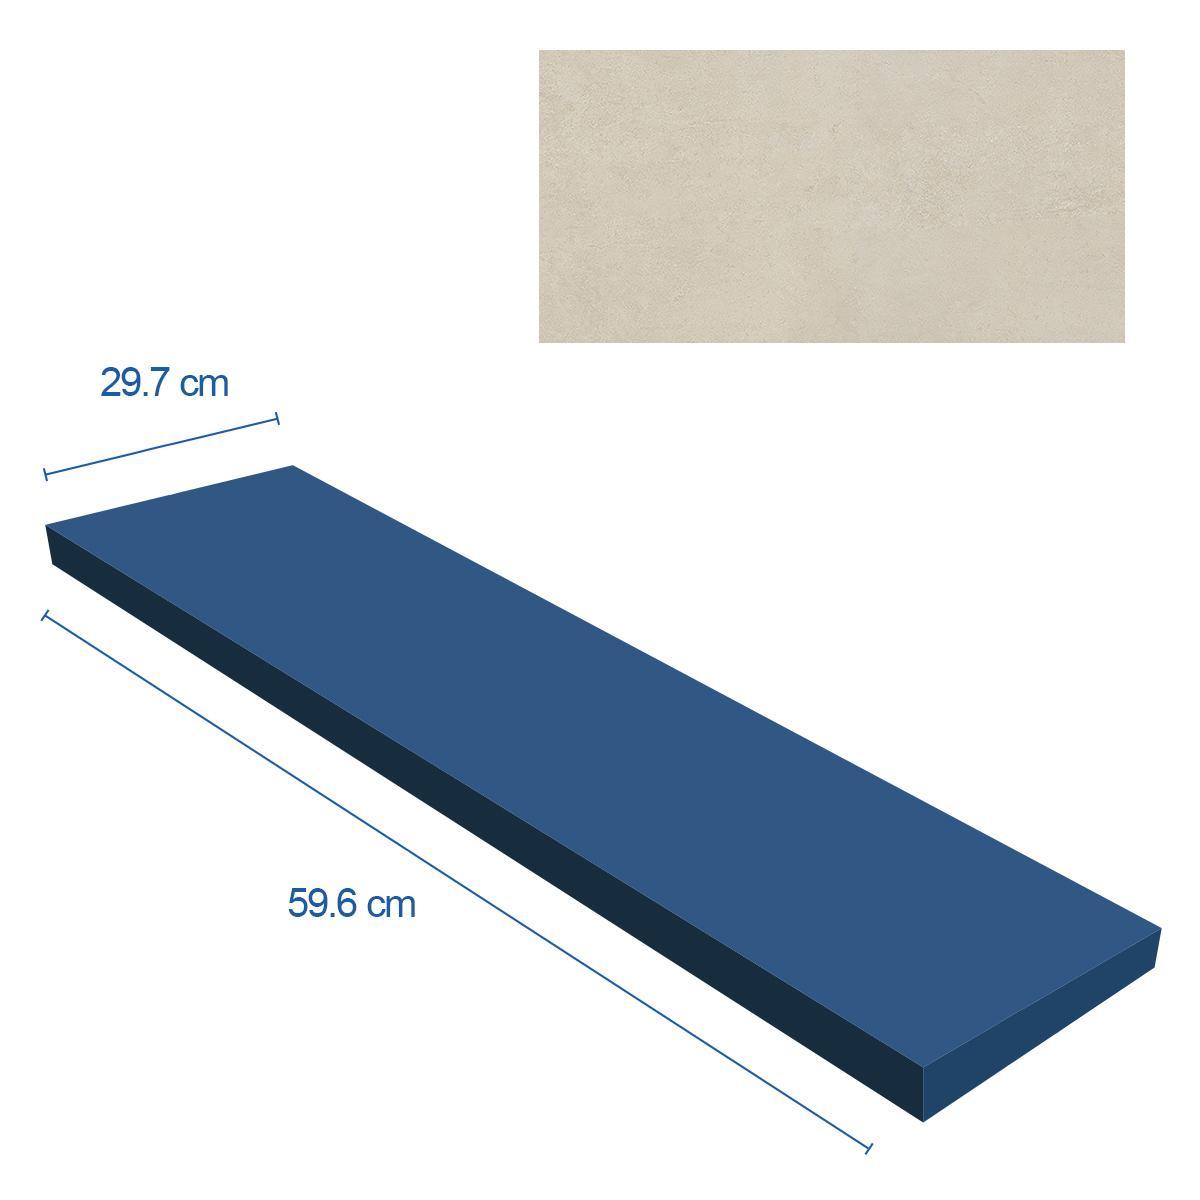 Porcelanato Morse Beige Mate - 29.7X59.6 cm - 0.88 m2